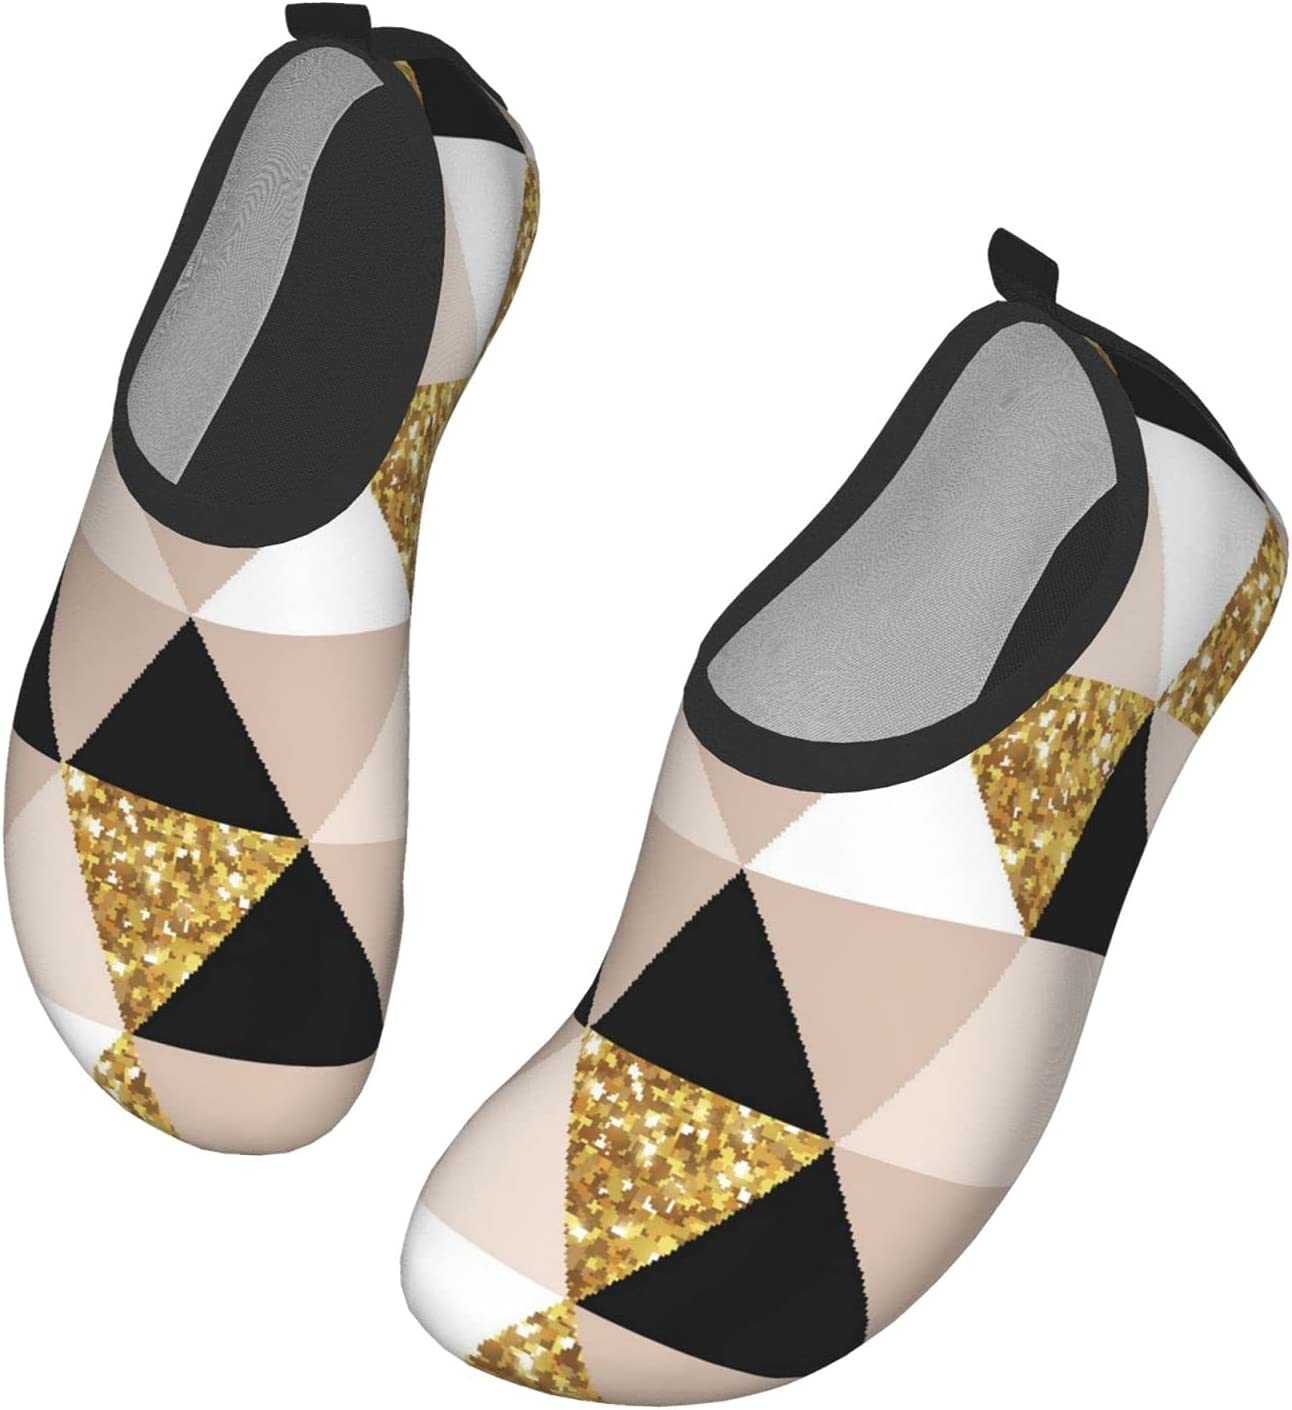 NA Color Square Brick Diagram Pattern Men's Women's Water Shoes Barefoot Quick Dry Slip-On Aqua Socks for Yoga Beach Sports Swim Surf